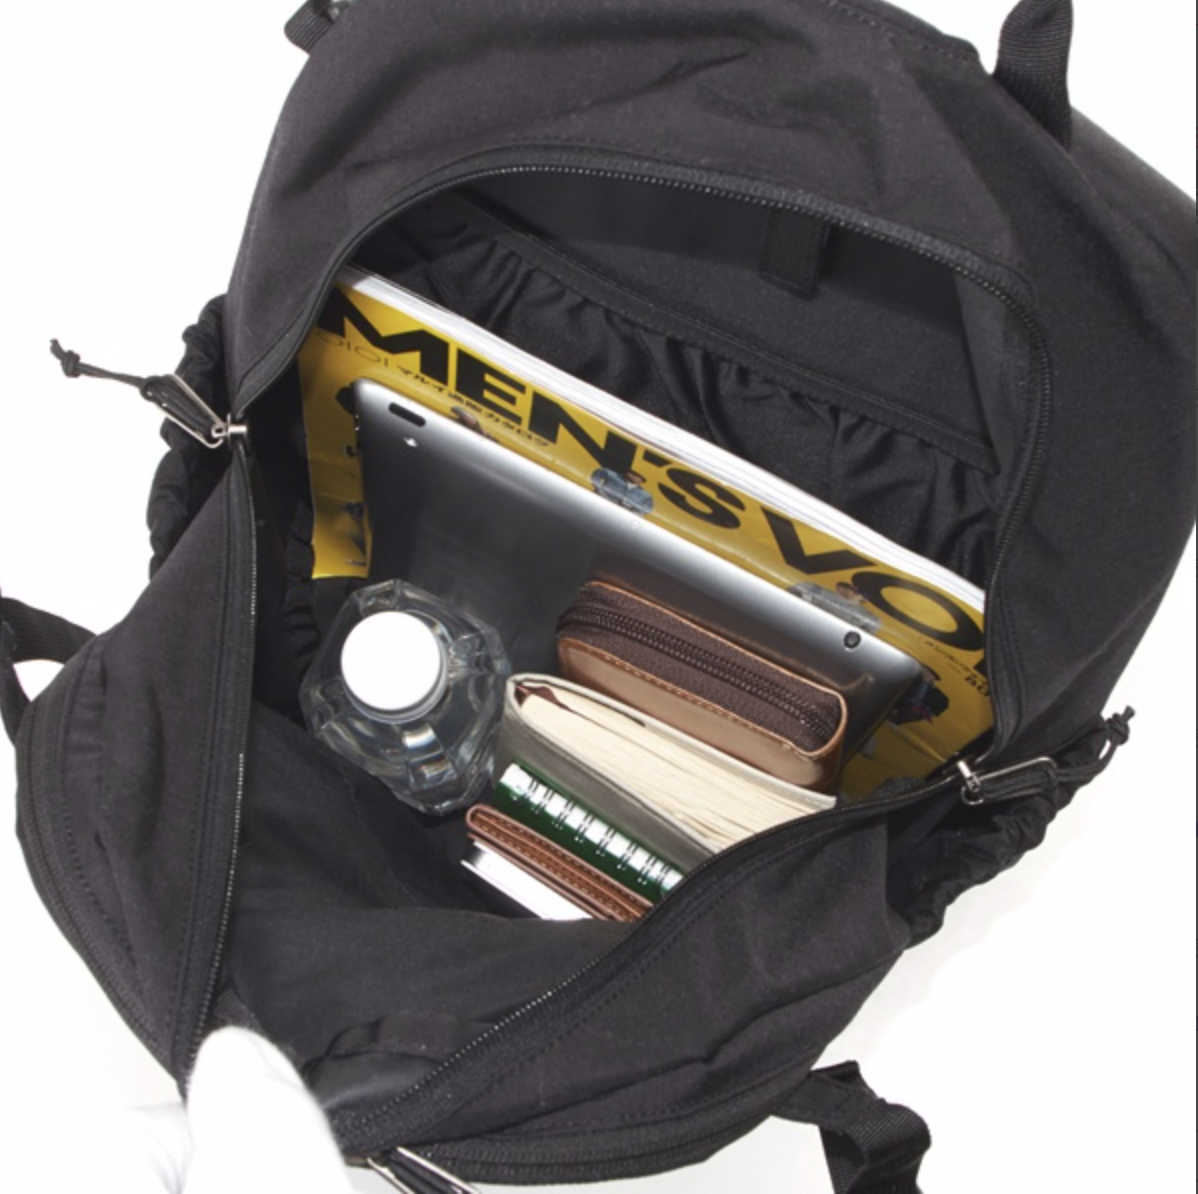 f:id:thebackpack:20190406090644p:plain